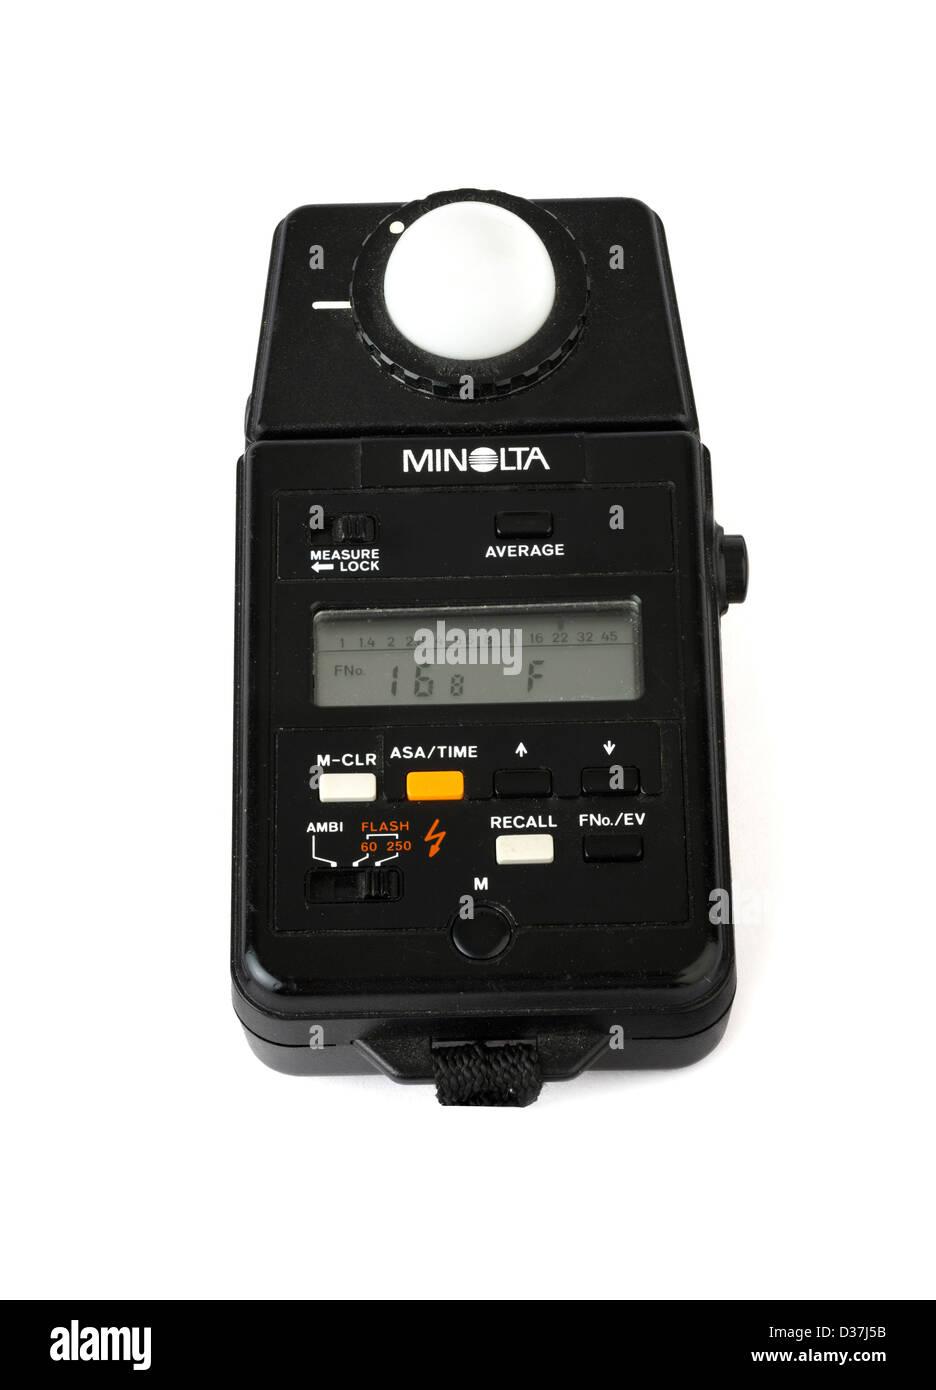 Minolta Exposure/Flash Meter - Stock Image